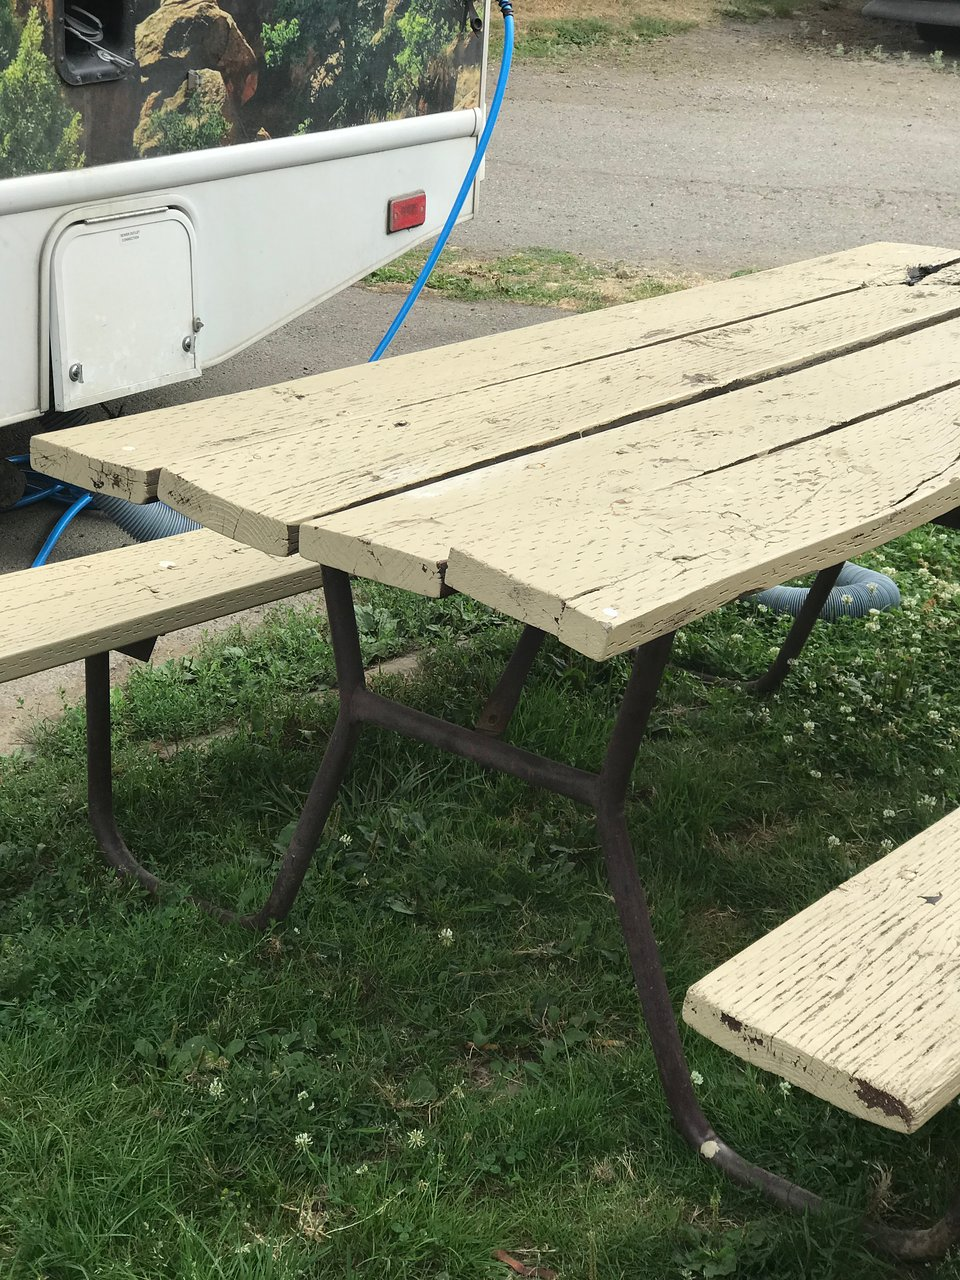 seattle tacoma koa updated 2019 campground reviews kent wa rh tripadvisor com